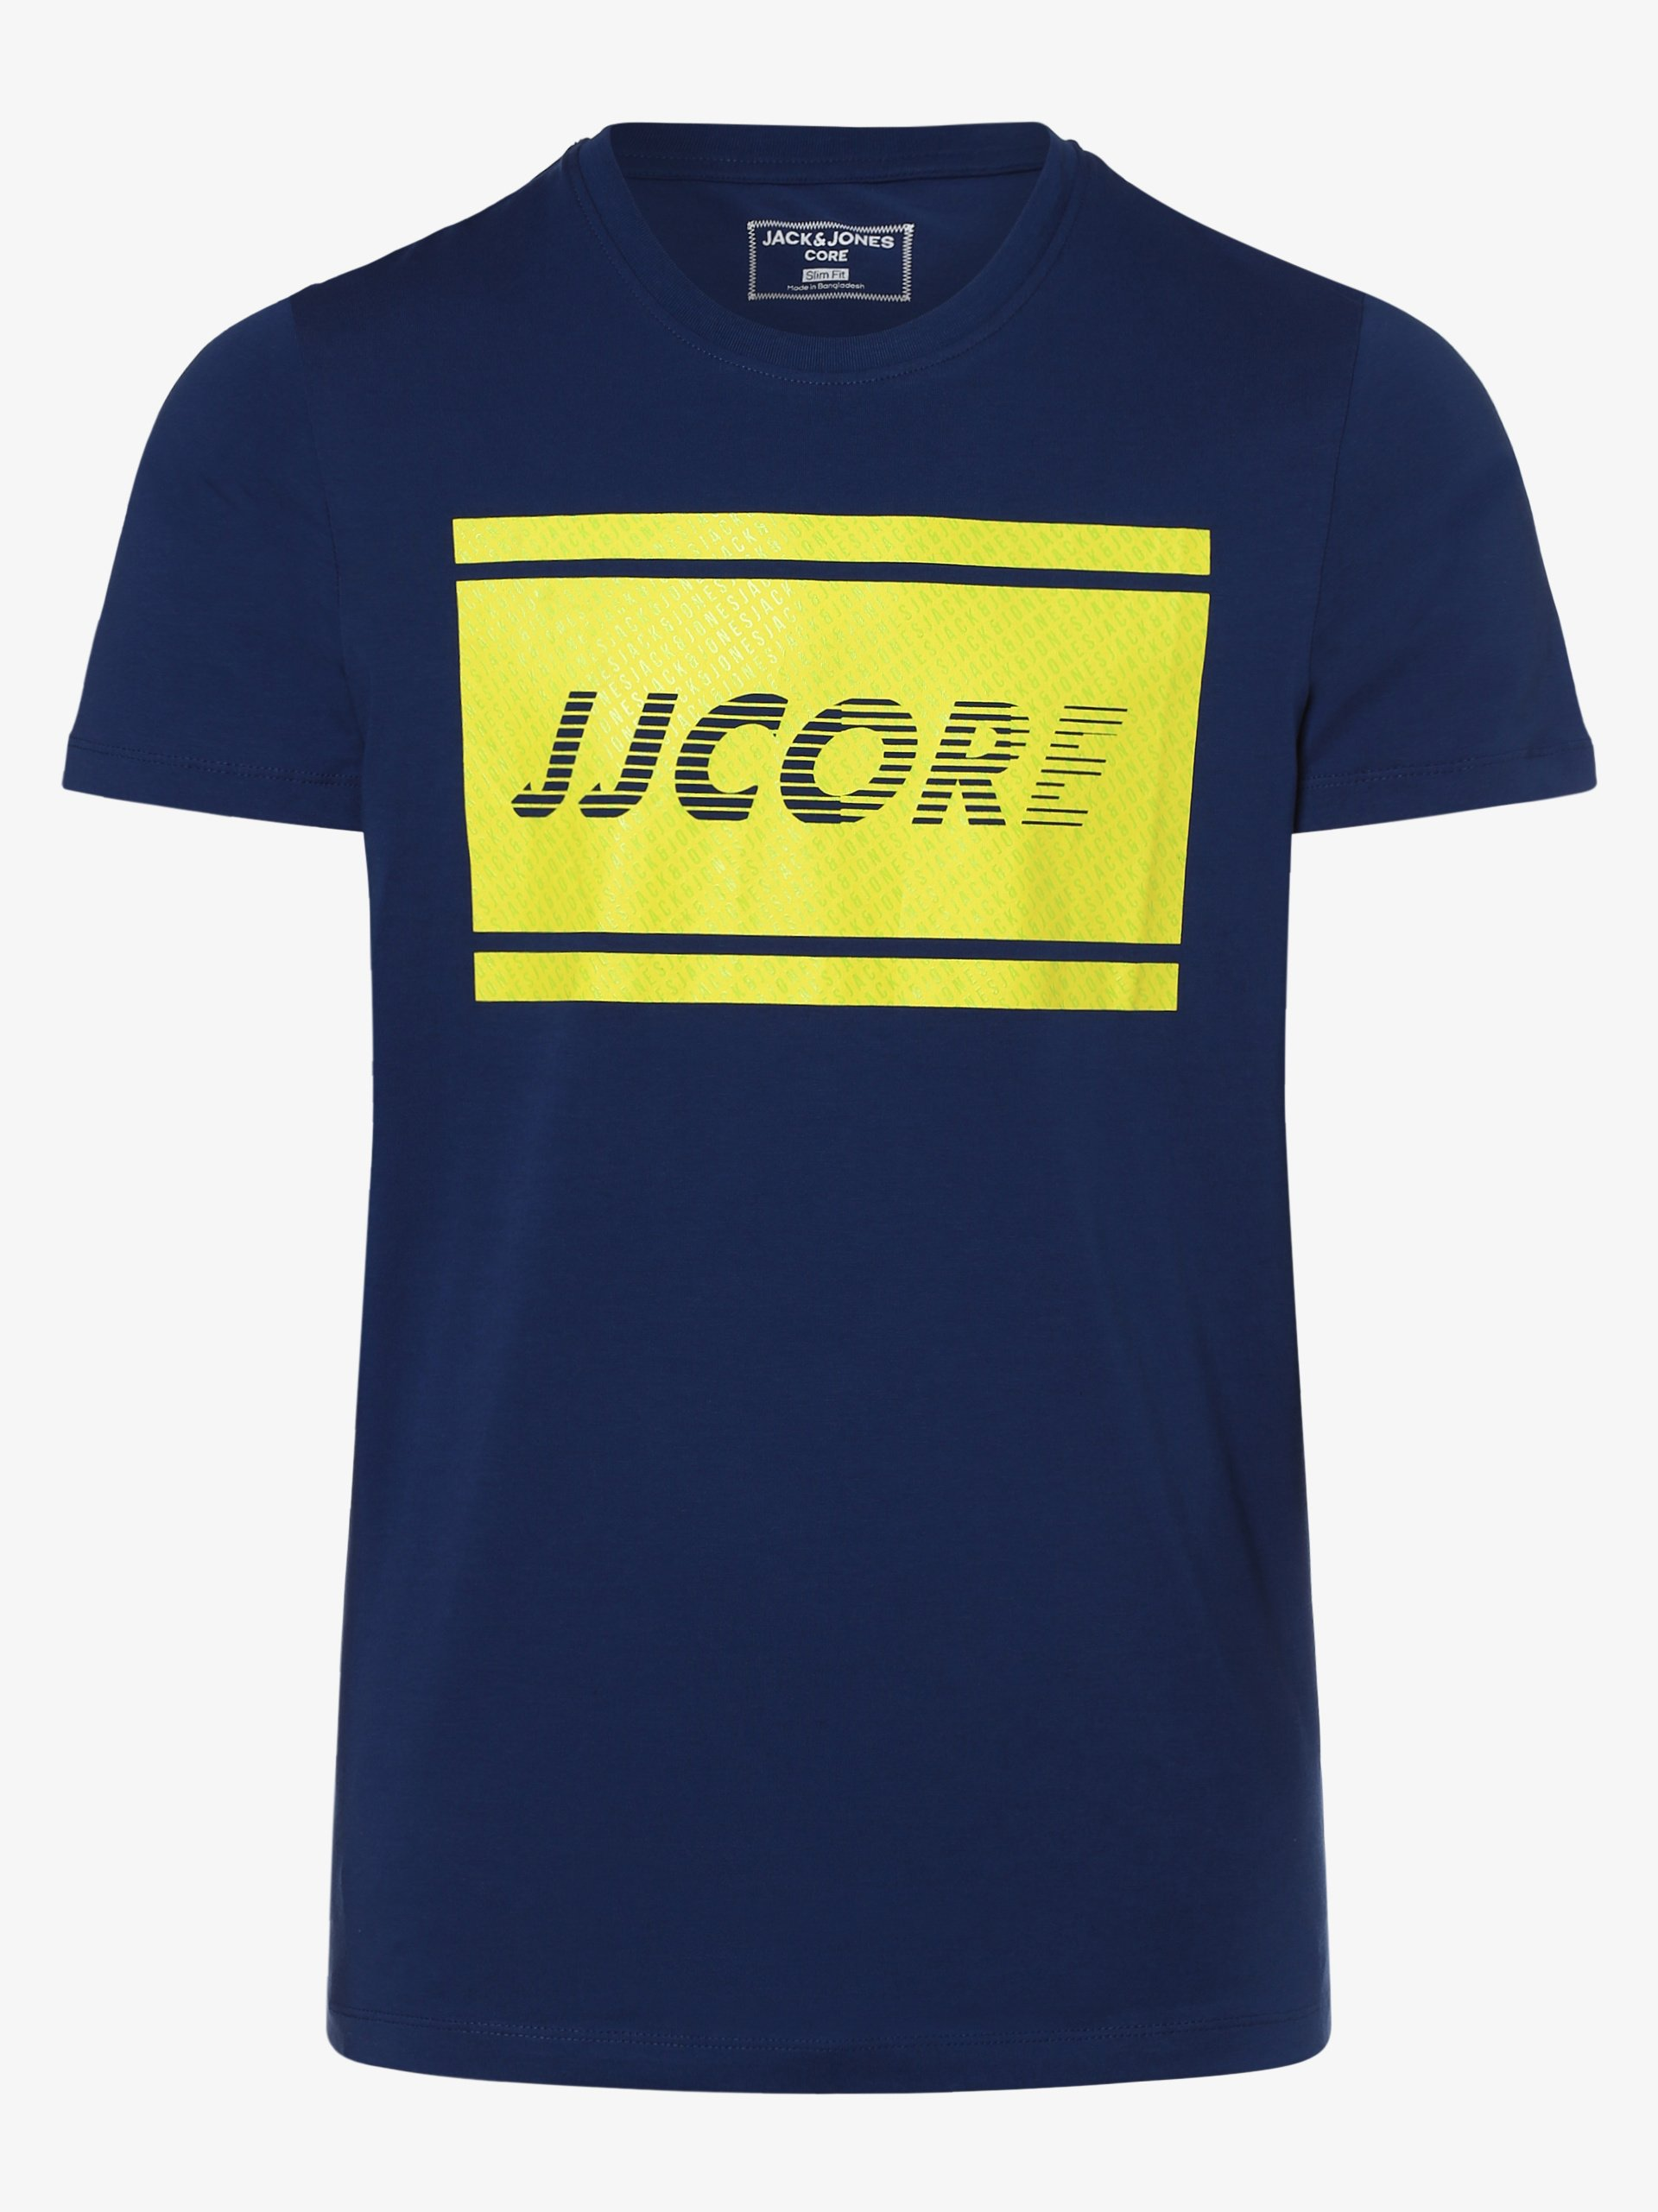 Jack & Jones T-shirt męski – Jcoidea